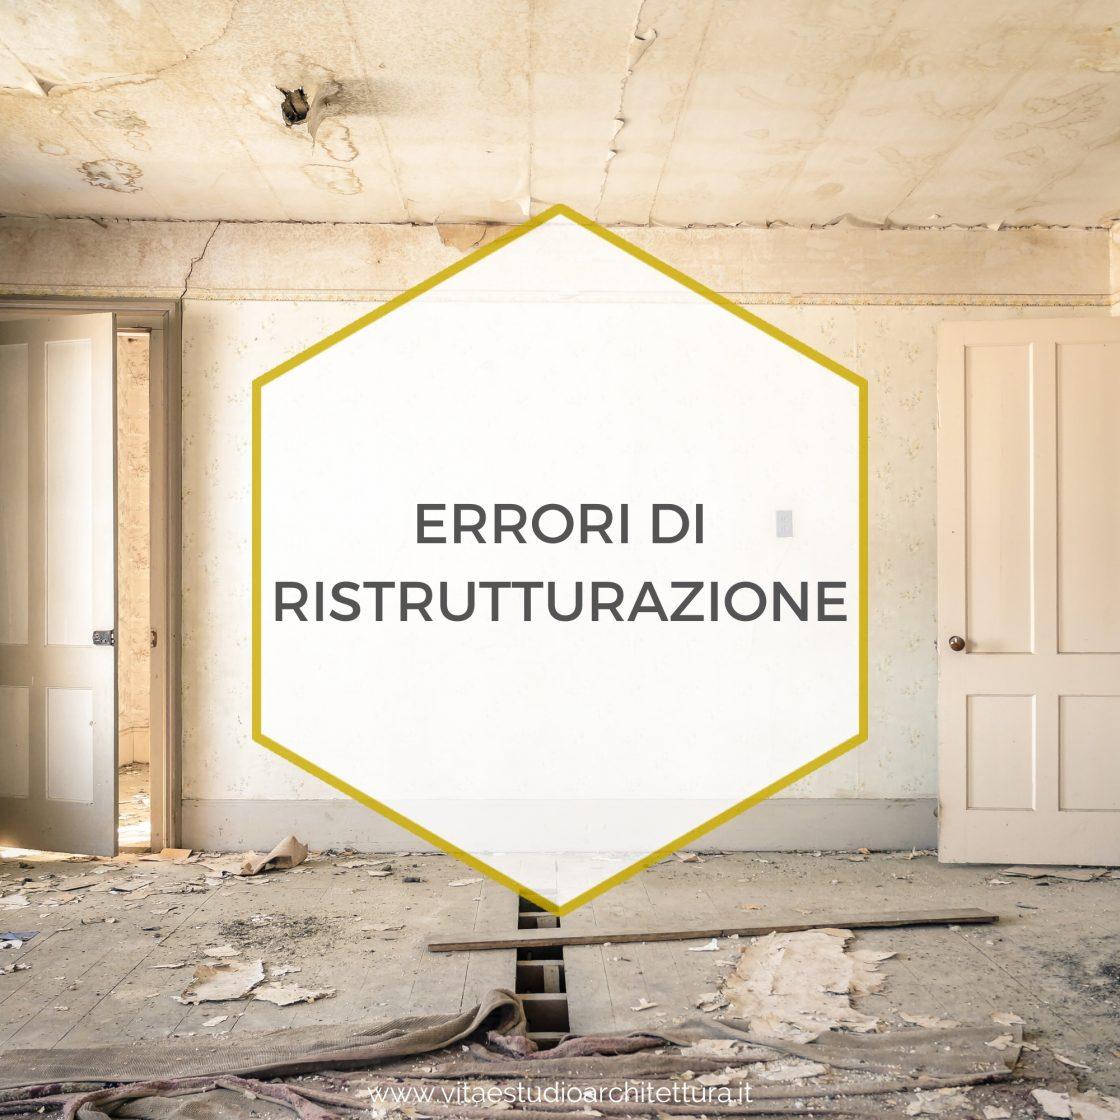 Errori di ristrutturazione